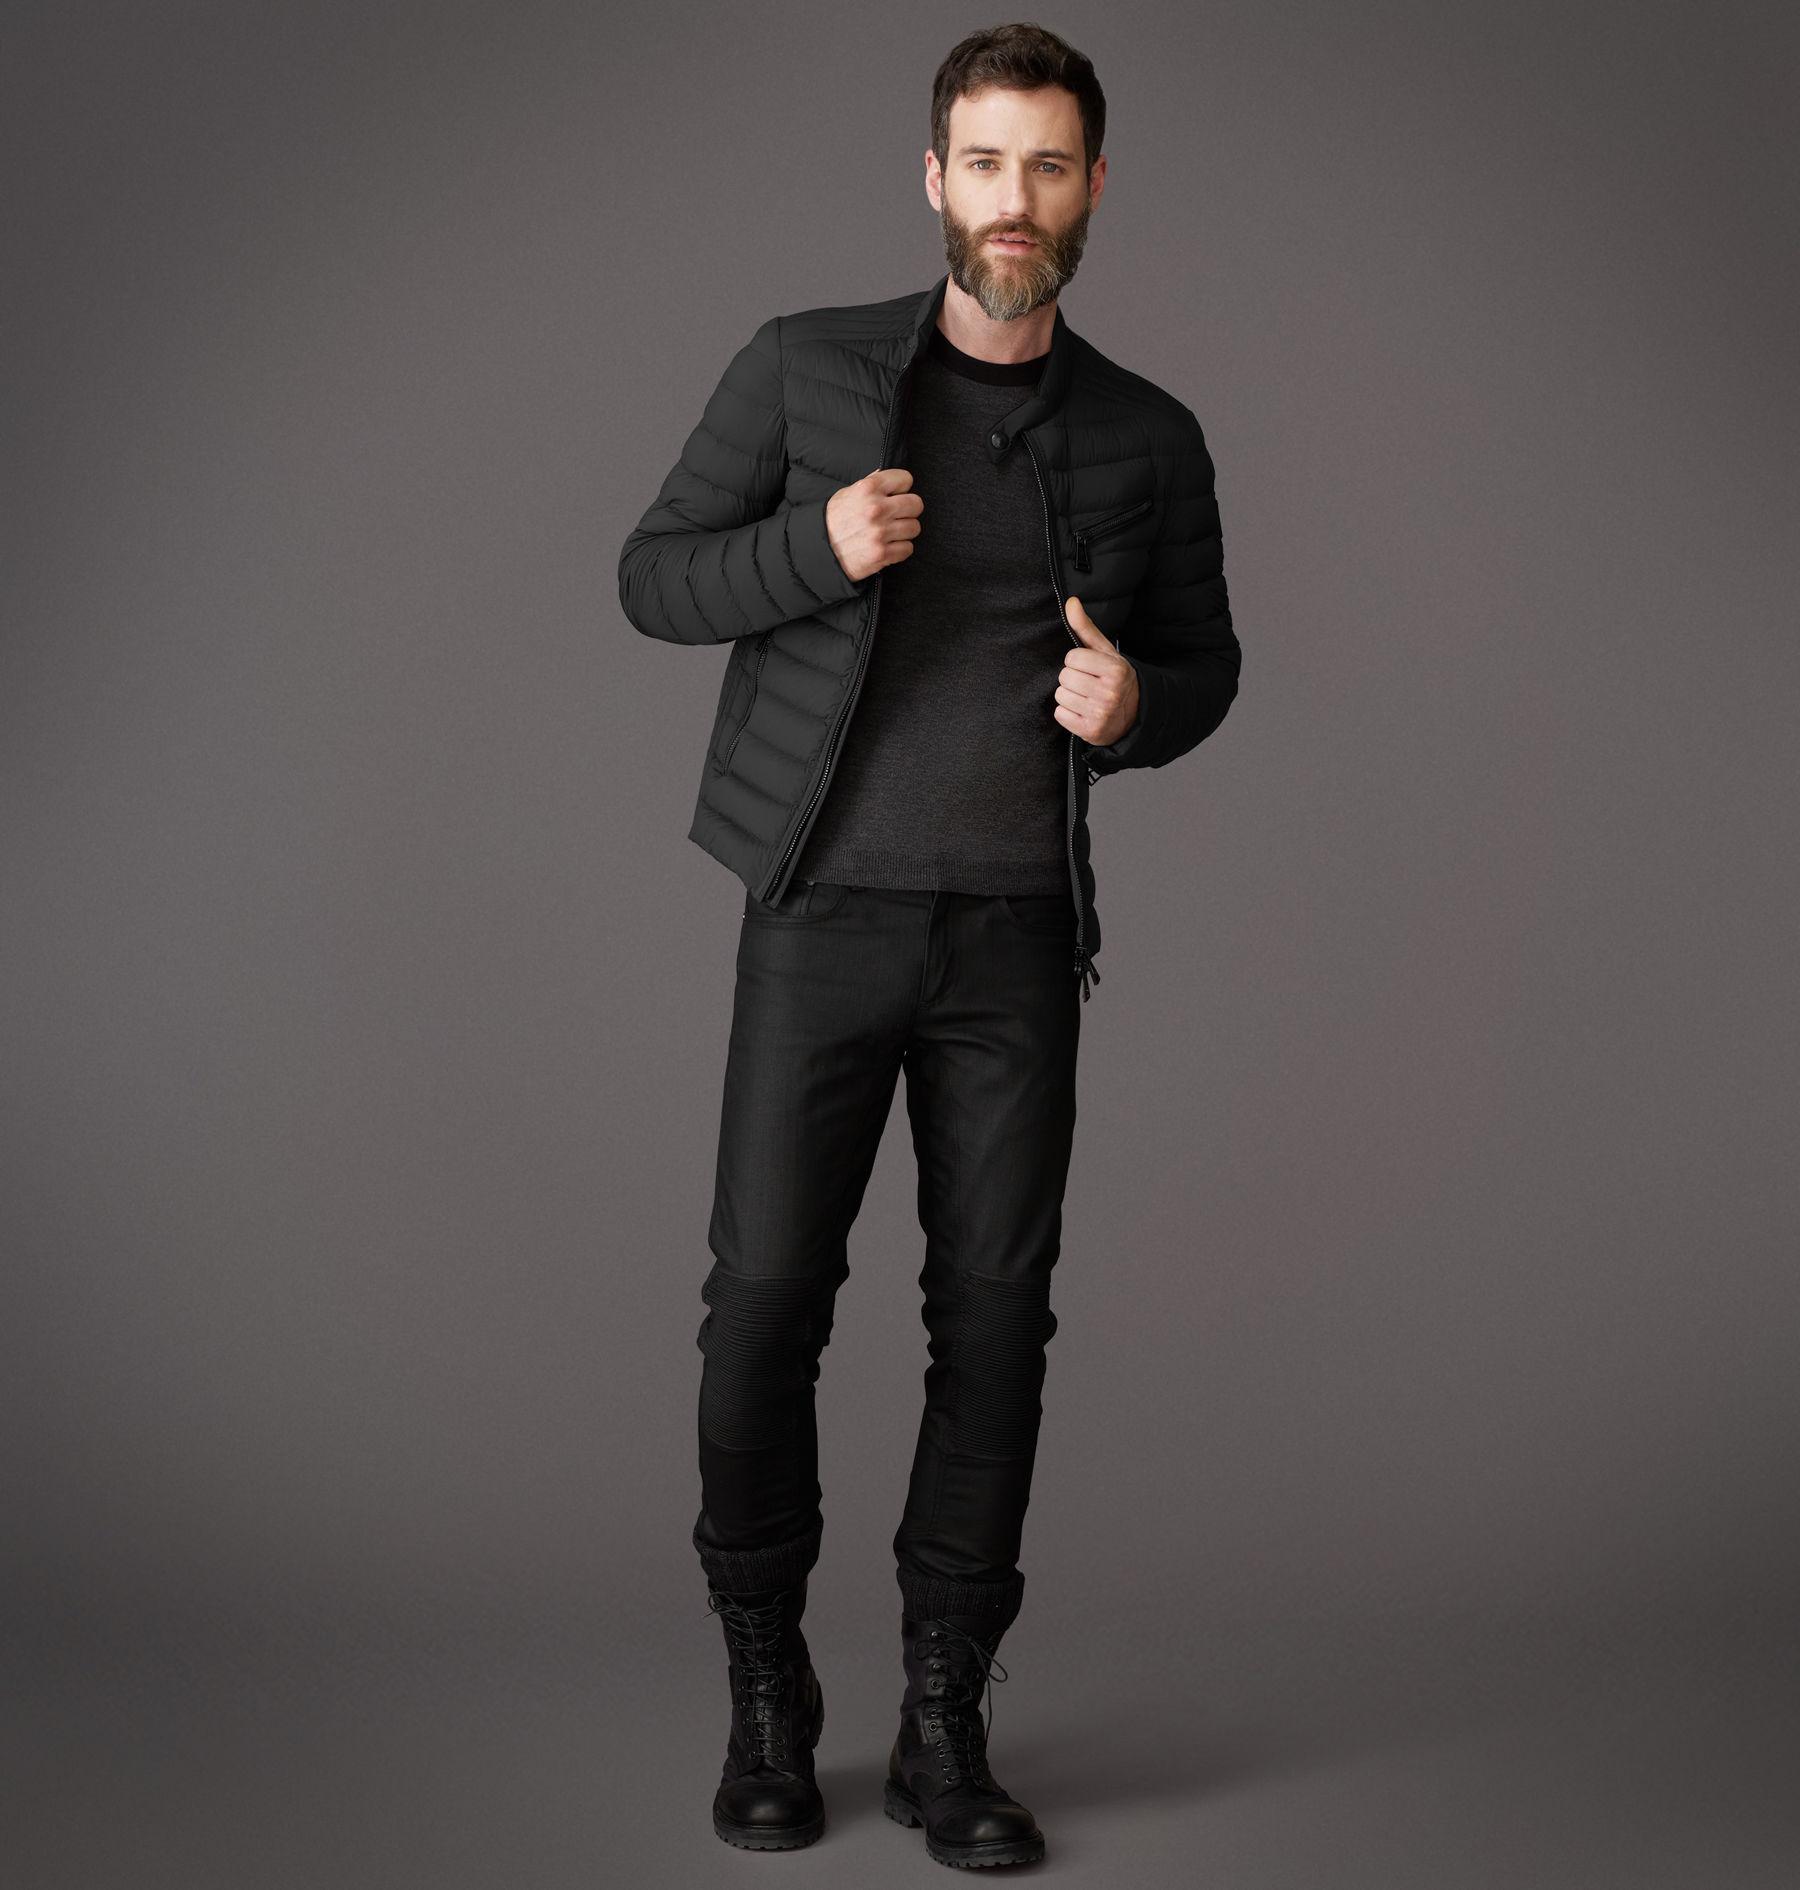 Leather jacket upkeep - Leather Jacket Upkeep 38